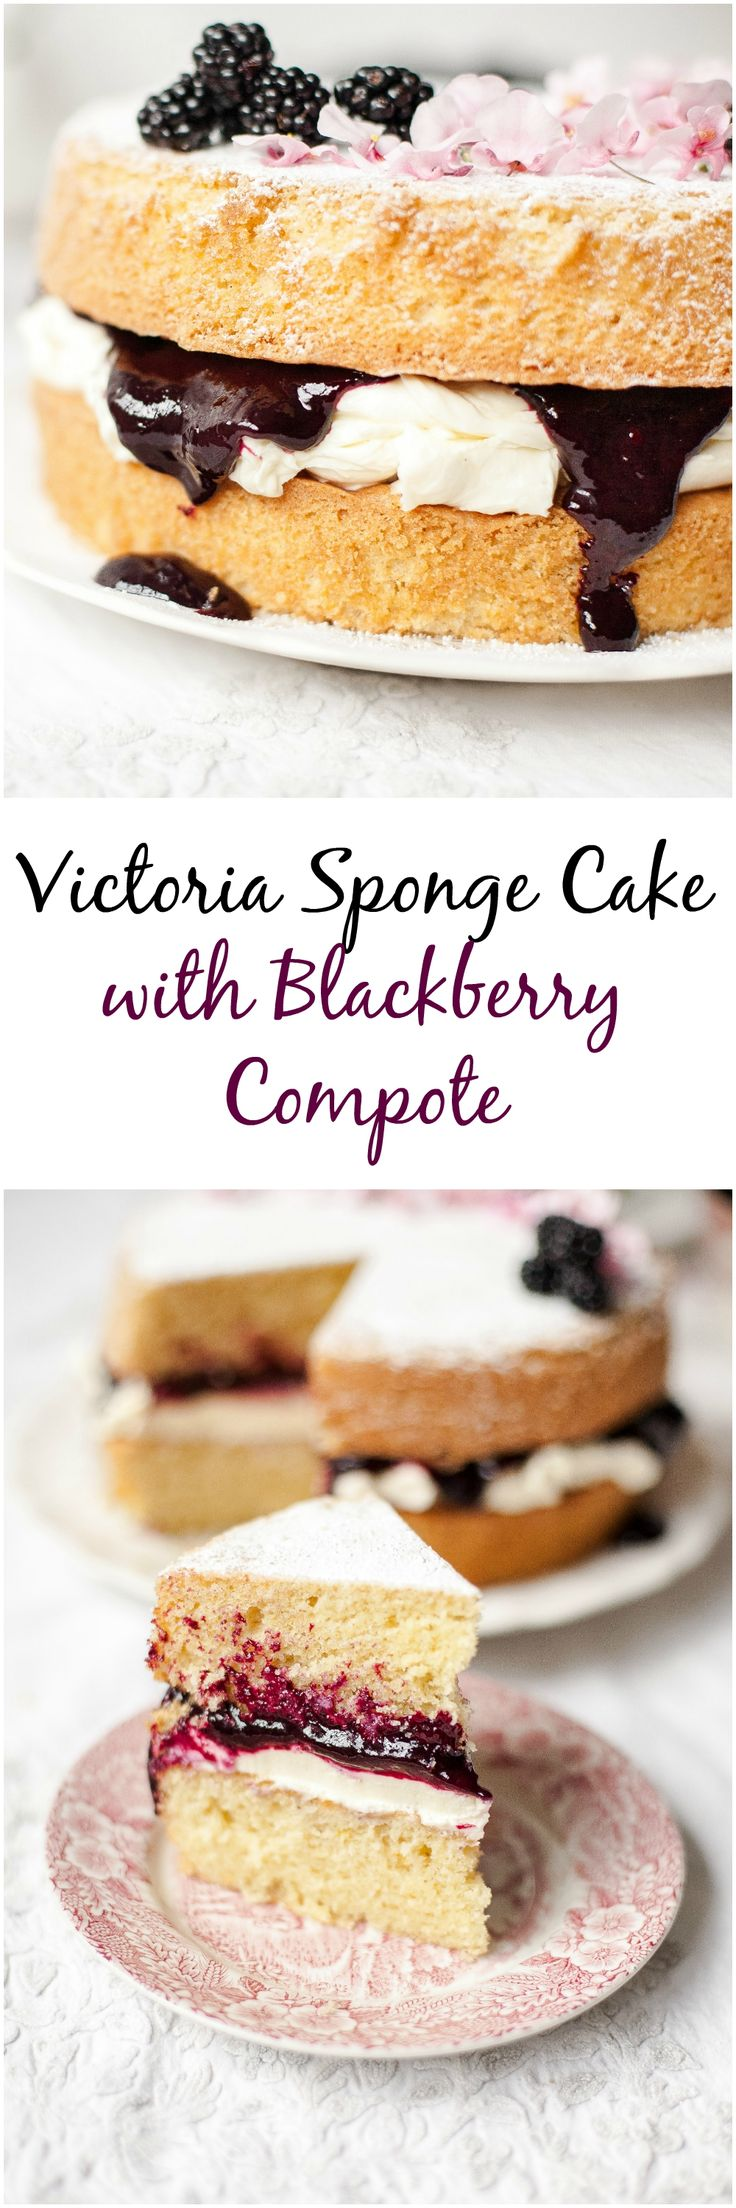 Classic Victoria Sponge Cake with Blackberry compote.